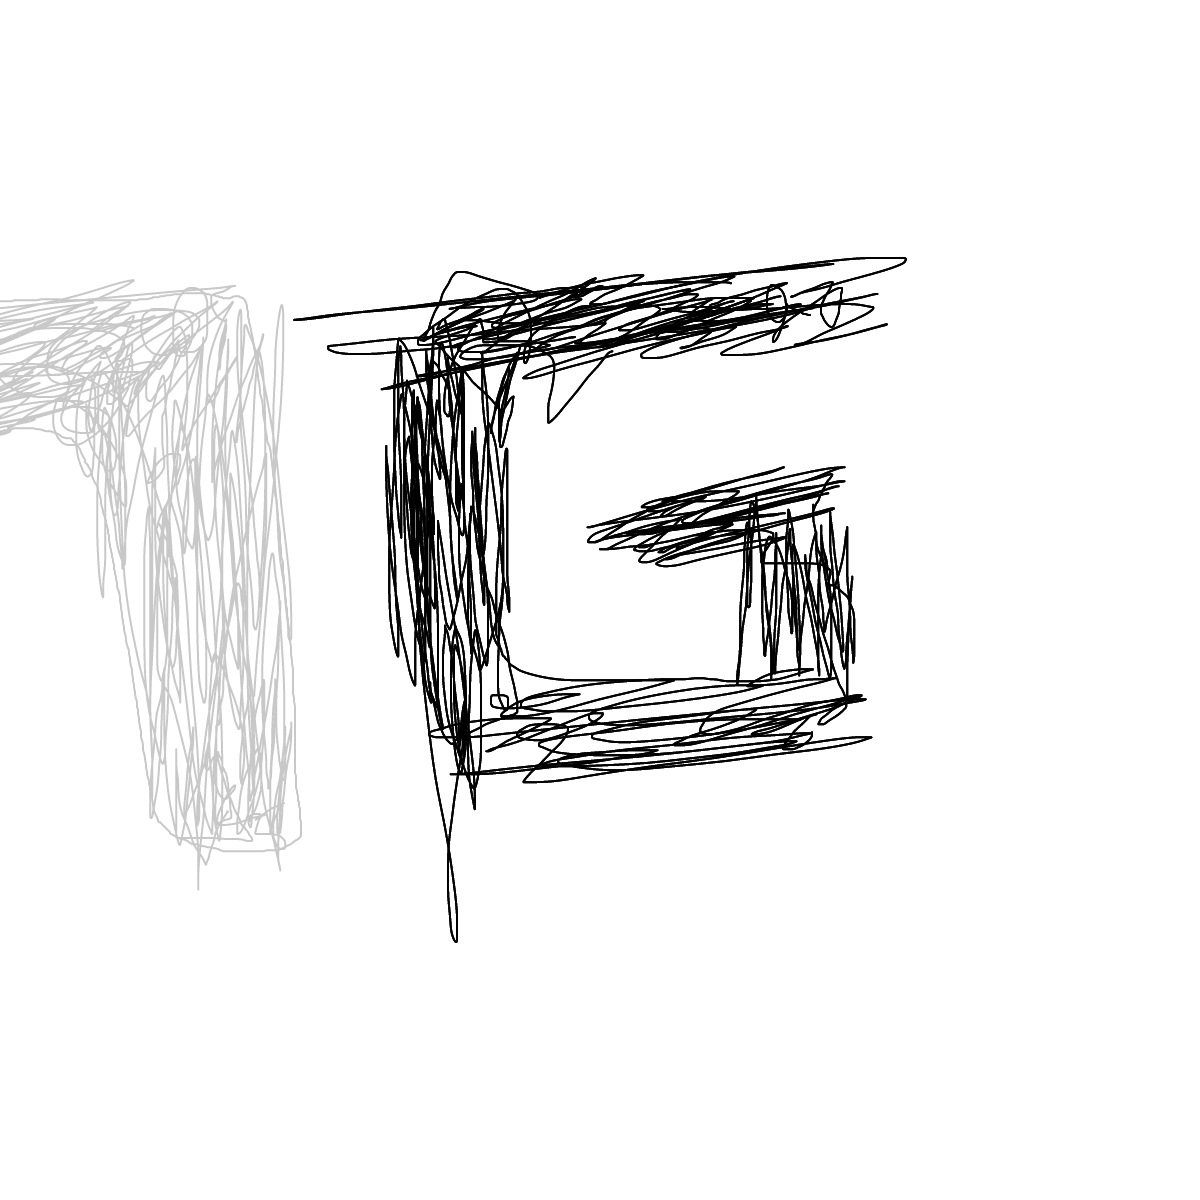 BAAAM drawing#17668 lat:49.2999954223632800lng: -122.7785491943359400